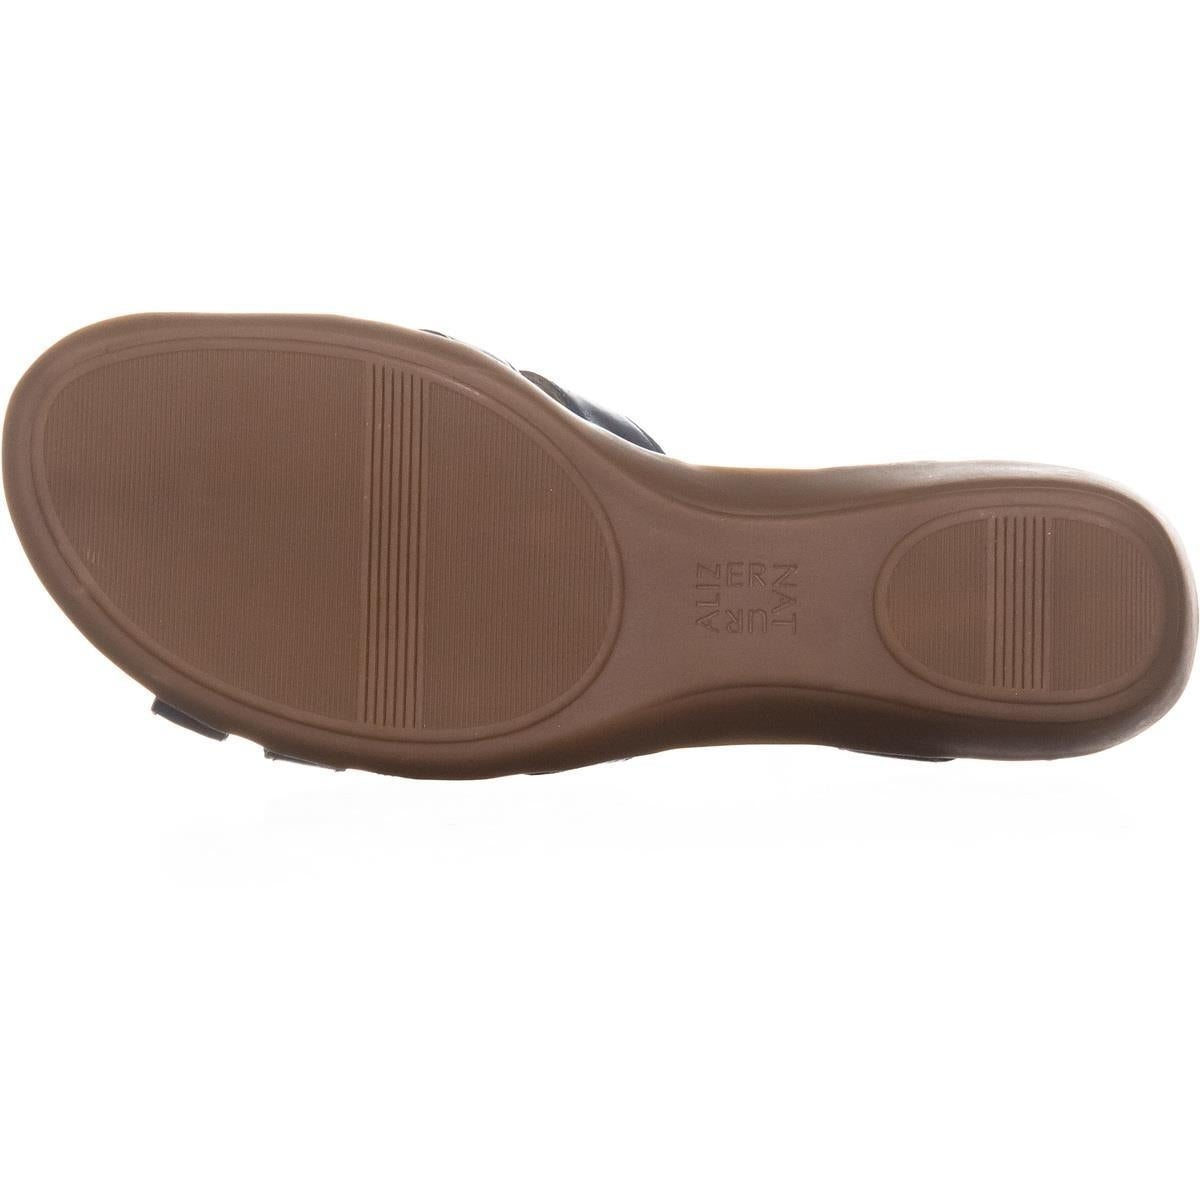 8e5df733983c Shop naturalizer Nella Ankle Strap Sandals